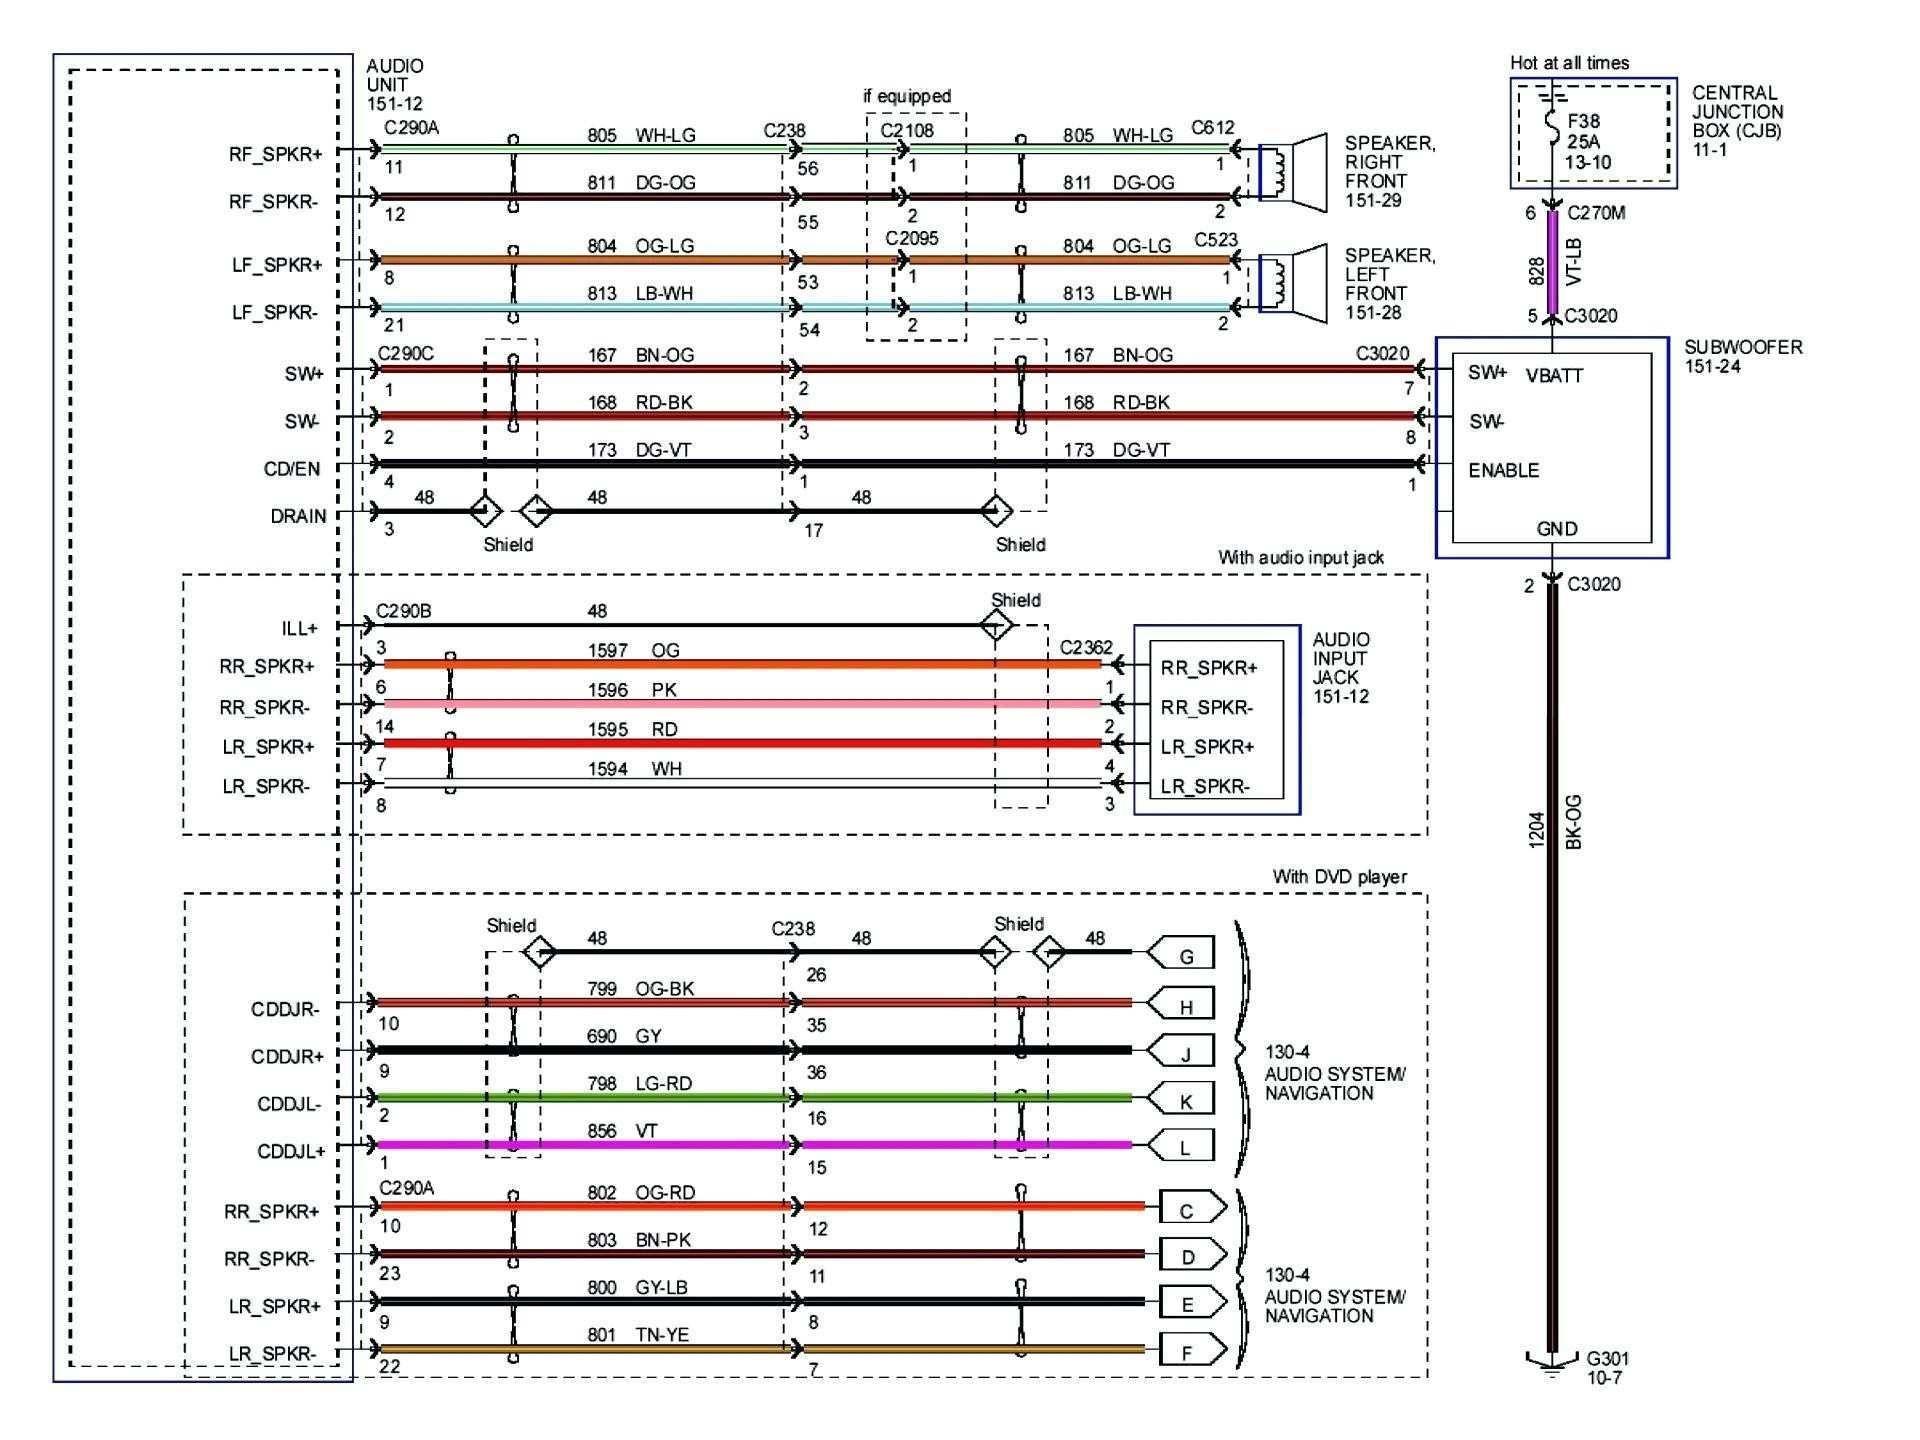 20 Auto Car Wiring Diagram Program With Images Electrical Wiring Diagram Diagram Design Trailer Wiring Diagram